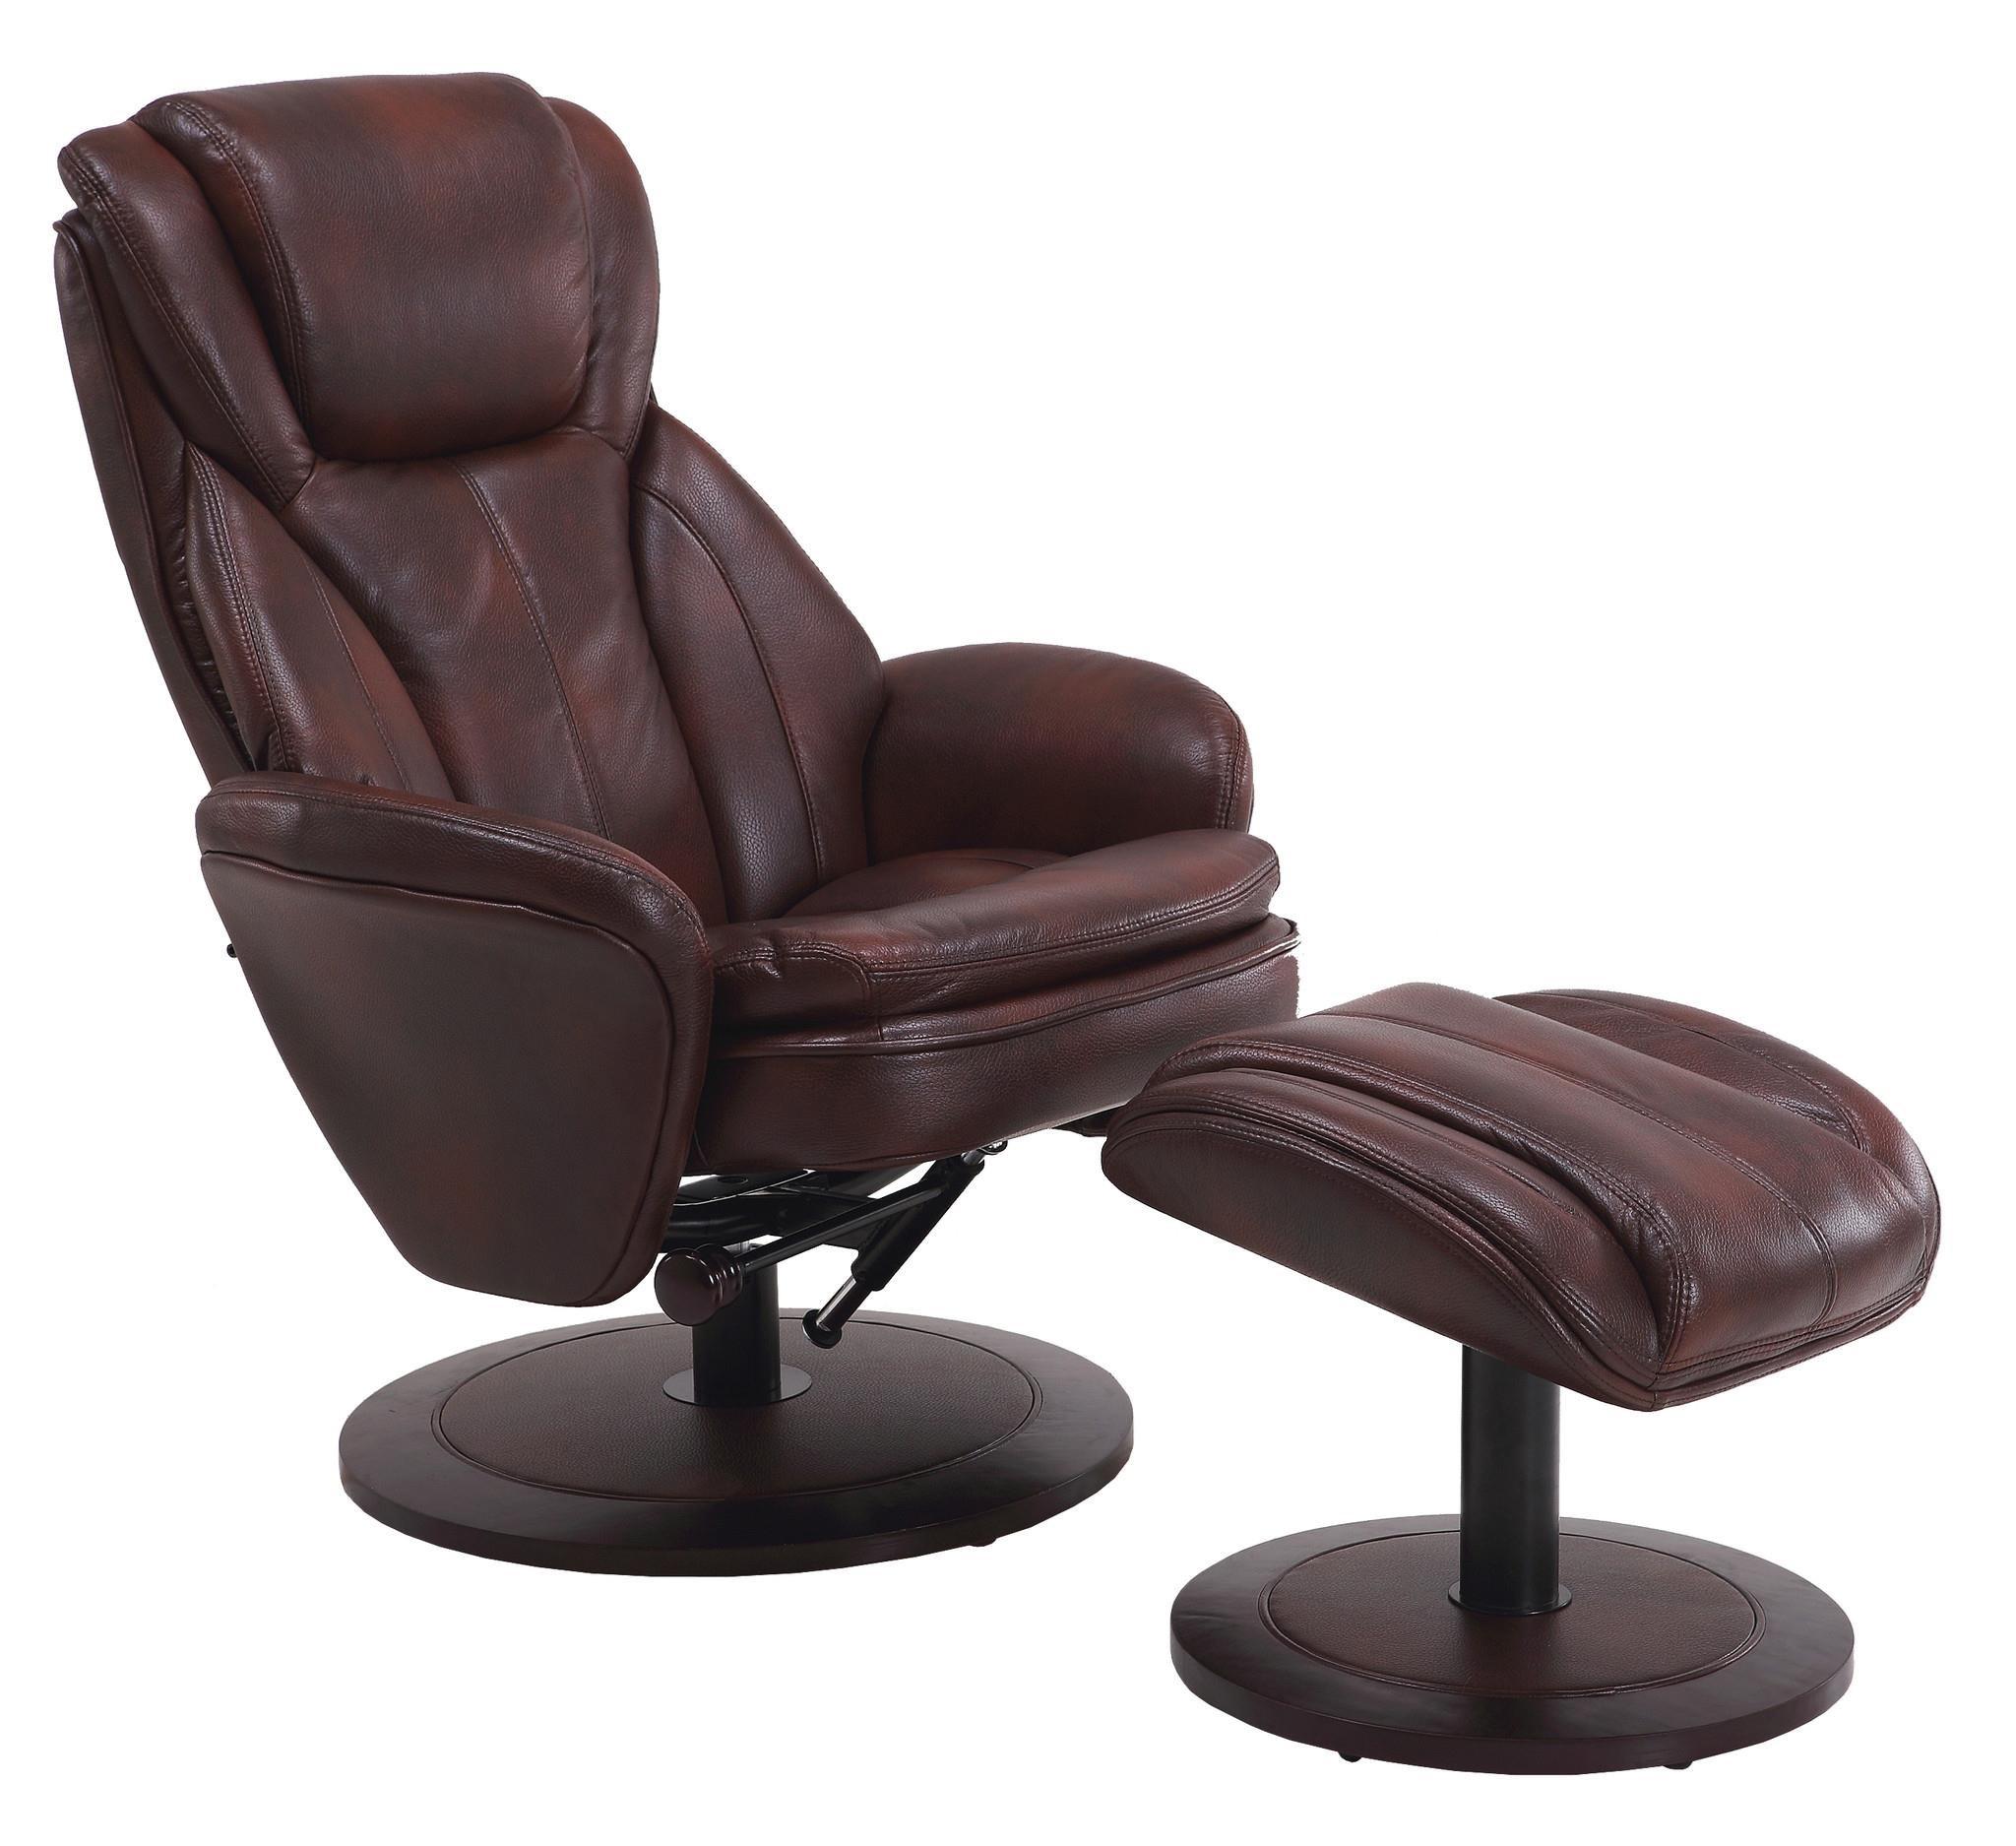 Mac Motion Chairs Reclining Chair & Ottoman Ruby Gordon